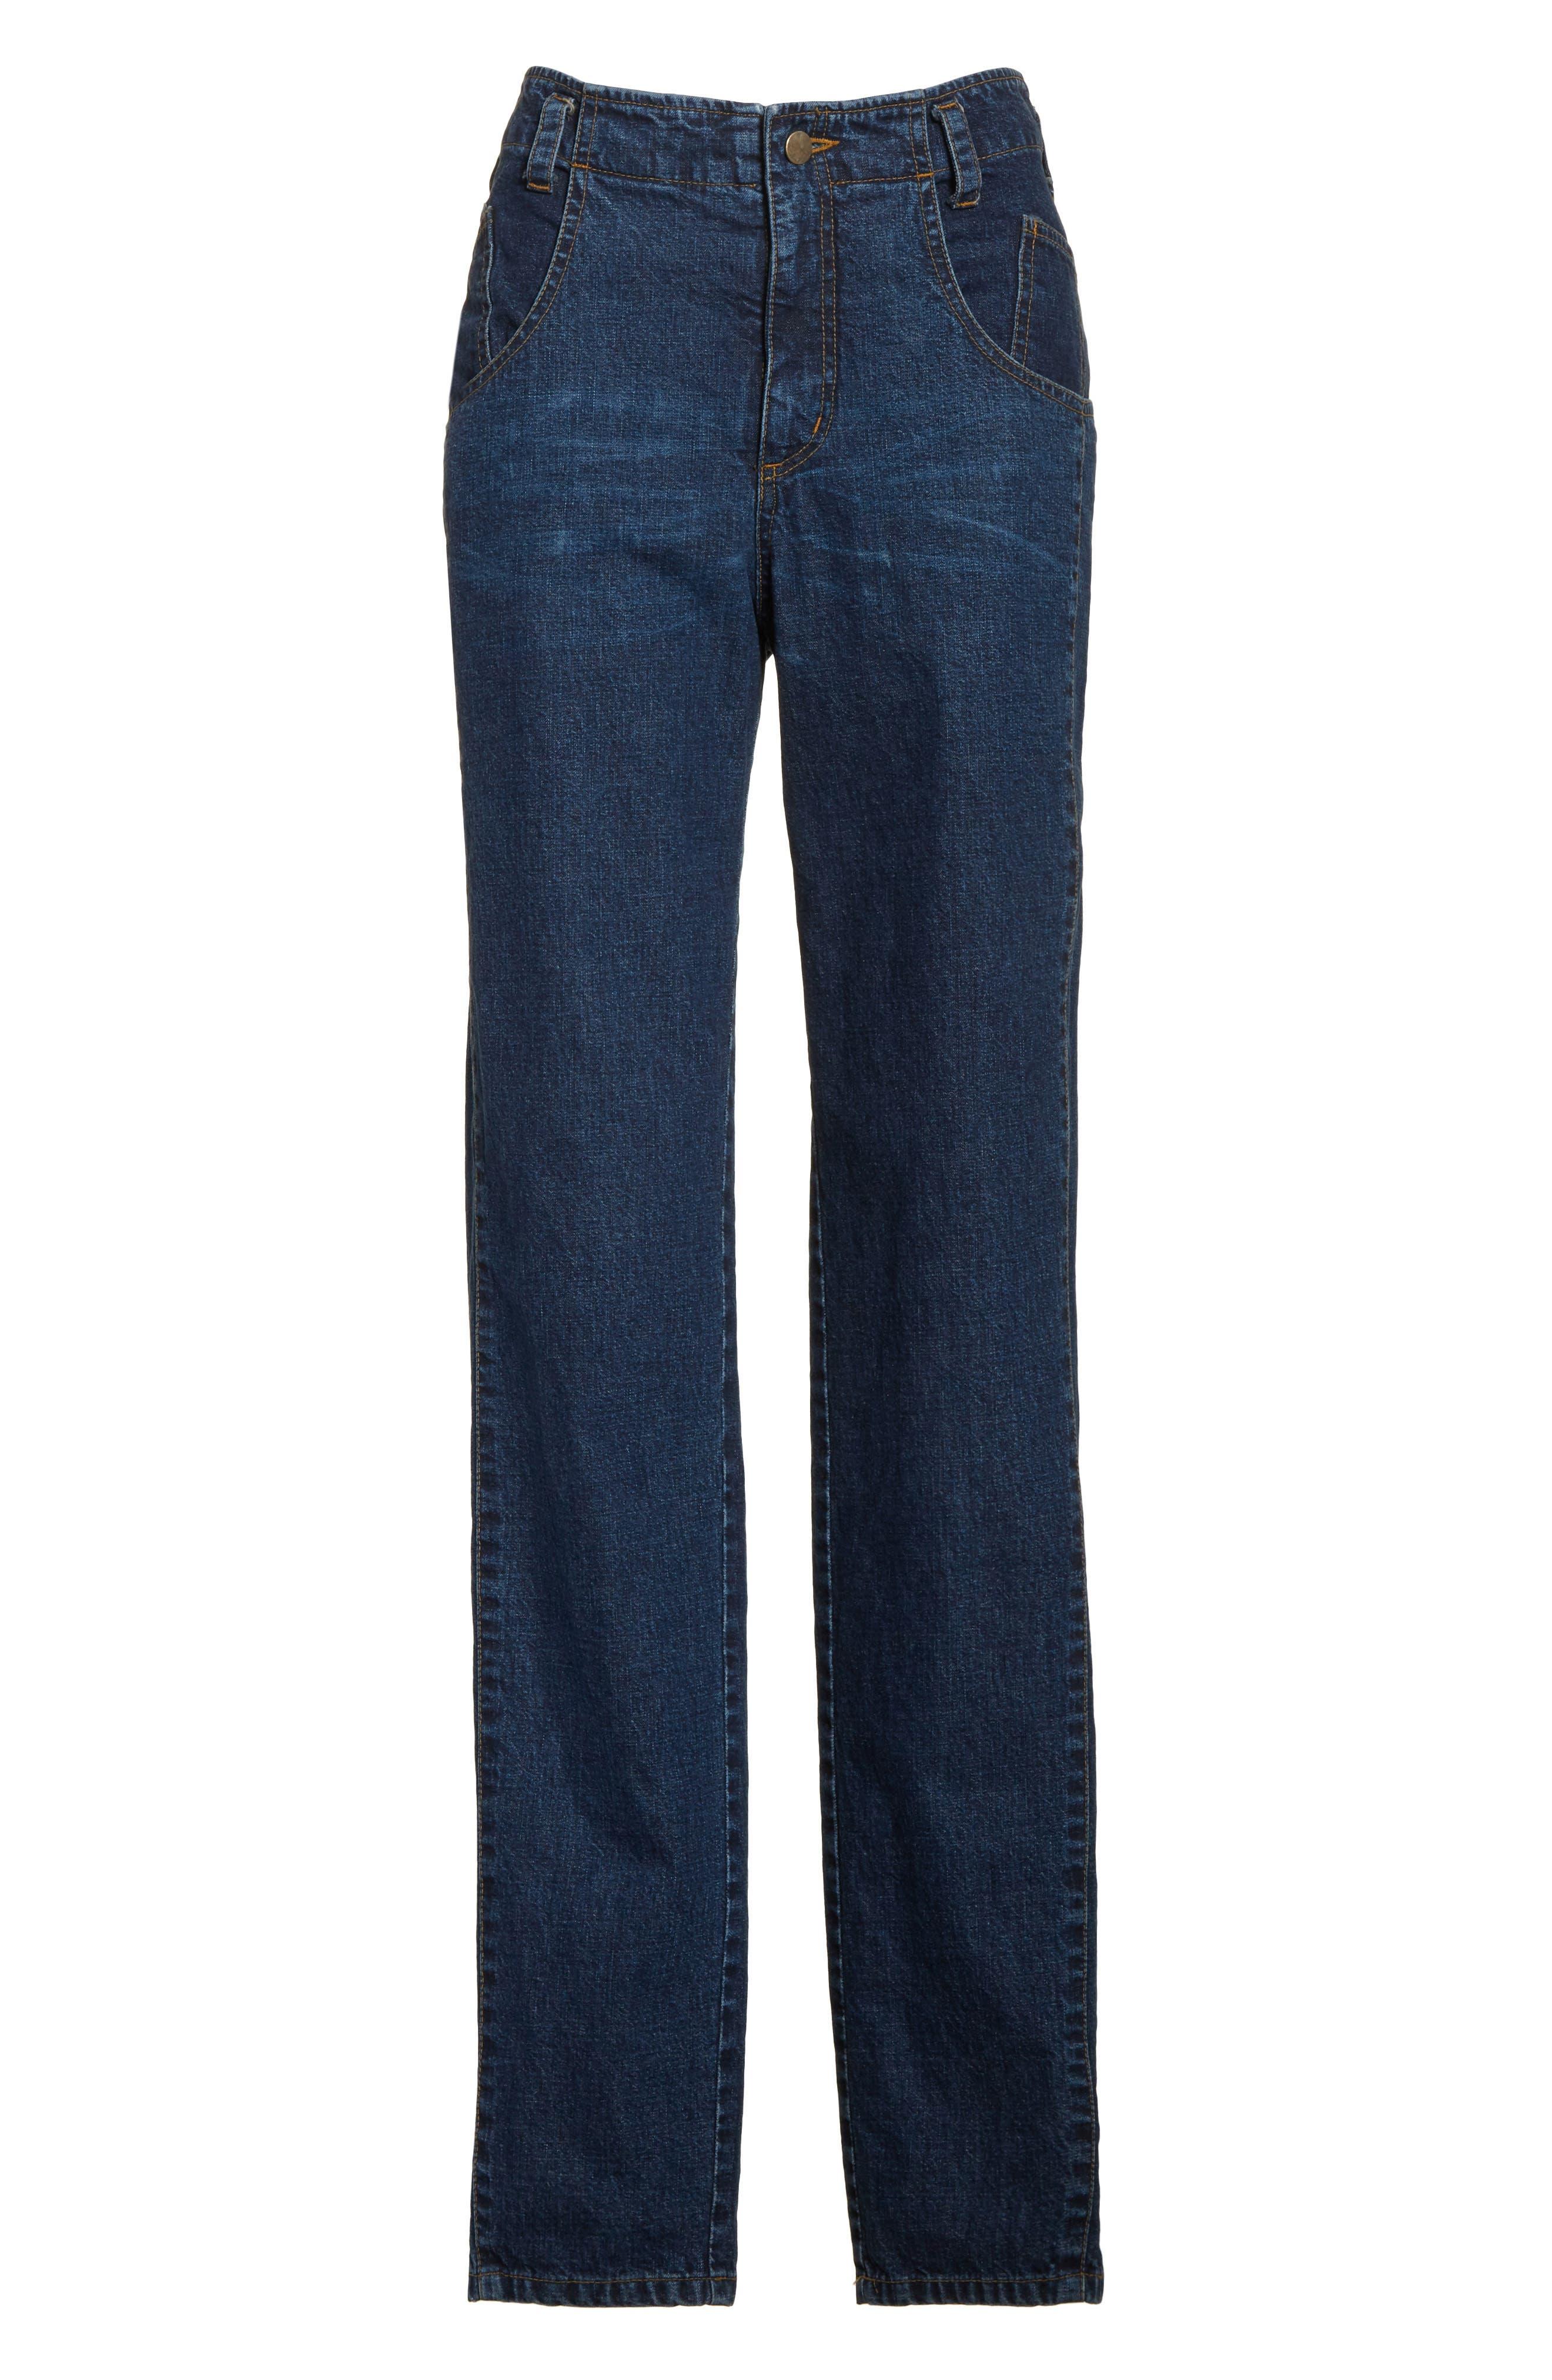 Long Trigger Straight Leg Jeans,                             Alternate thumbnail 6, color,                             Classic Indigo